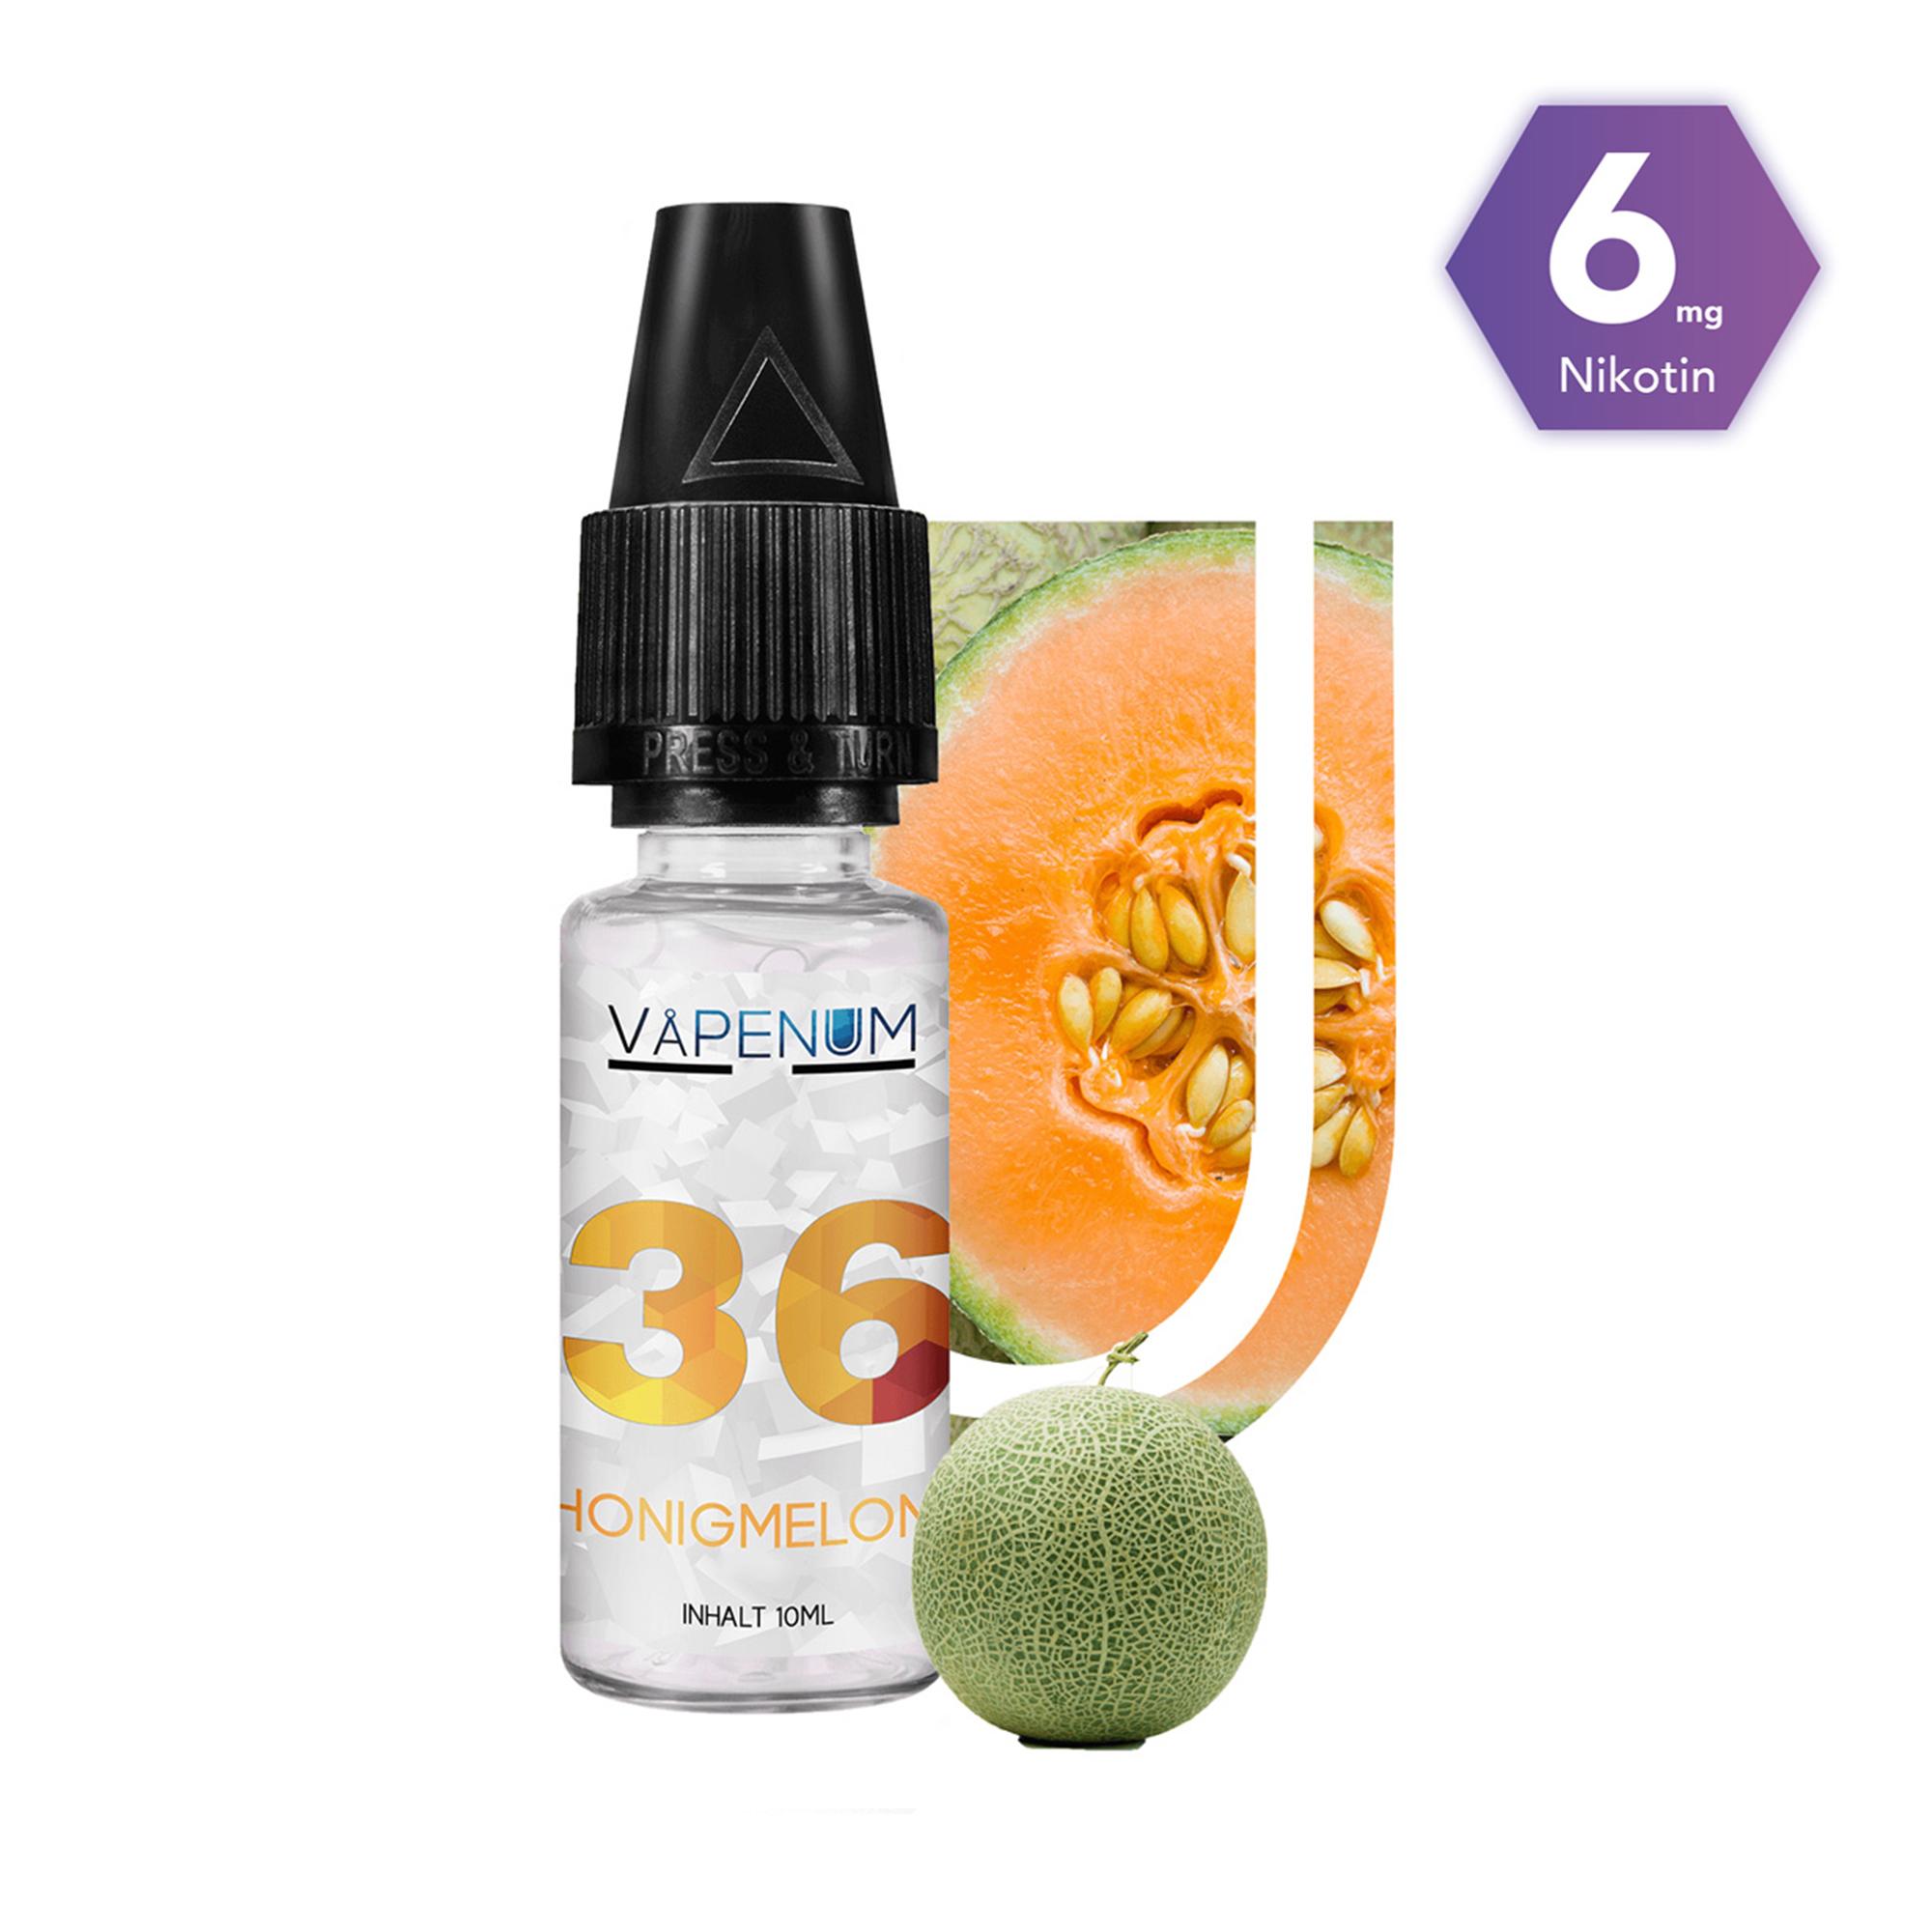 36 - Honigmelone Liquid by Vapenum